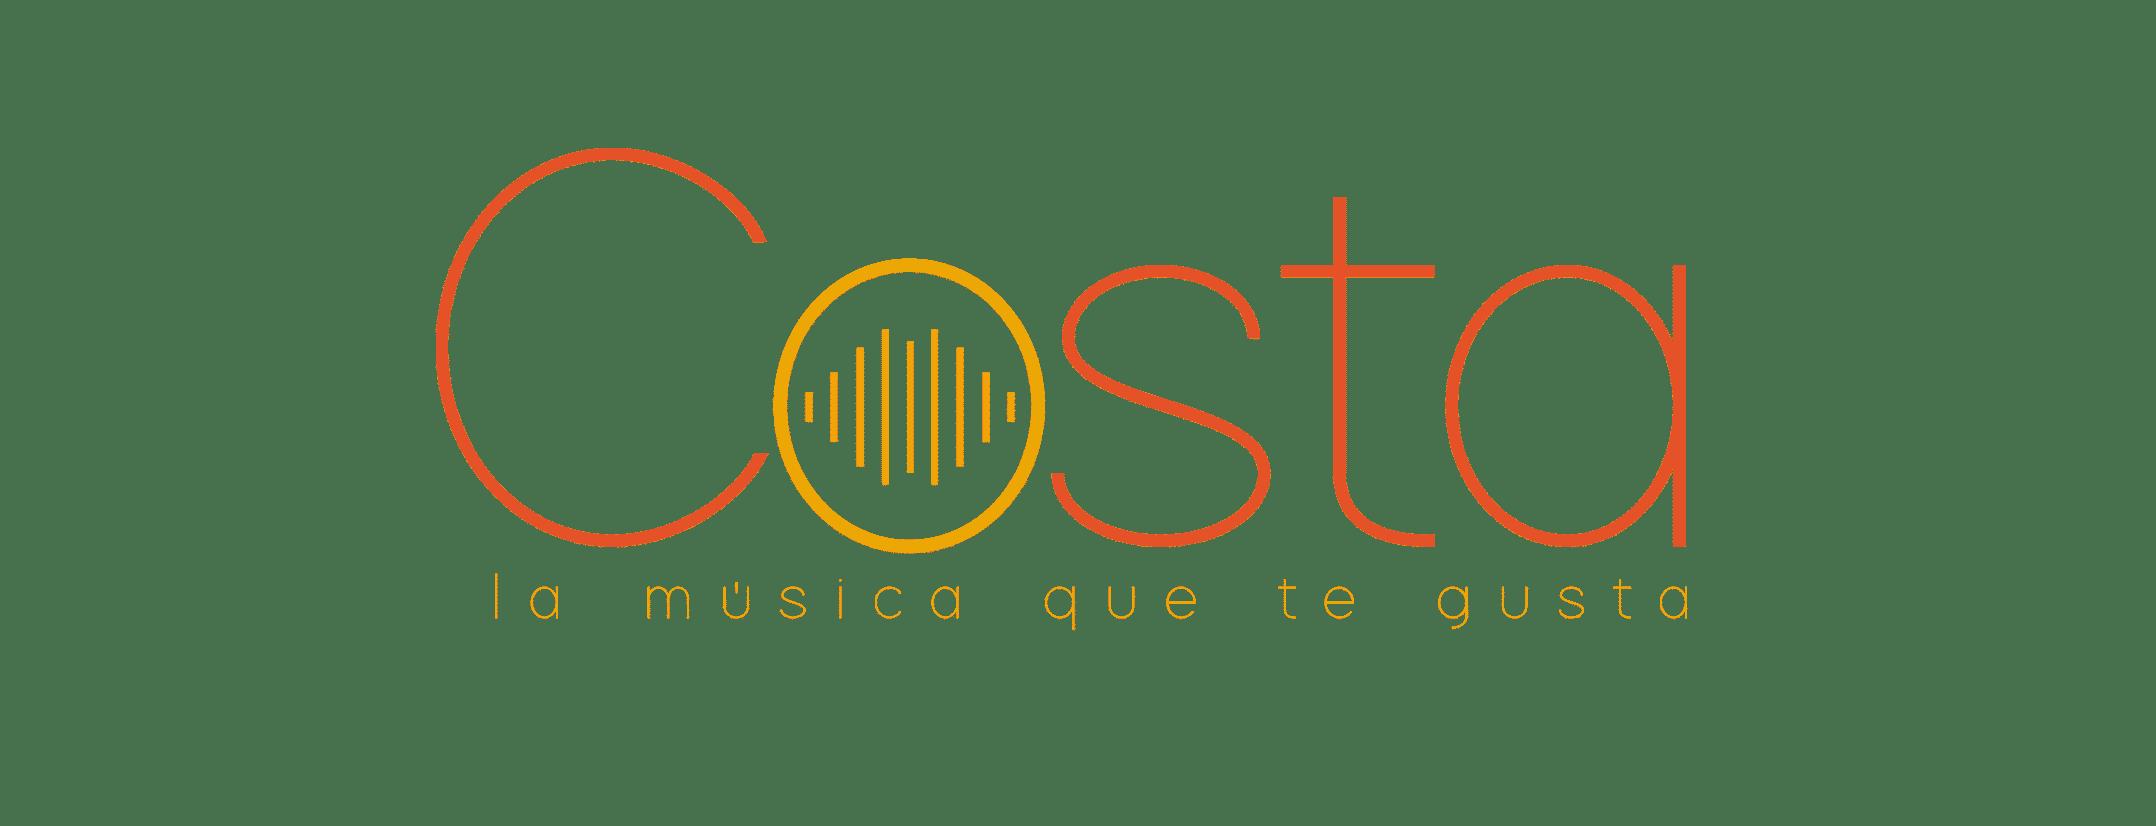 Costa FM - 92.3 fm - 92.8 fm